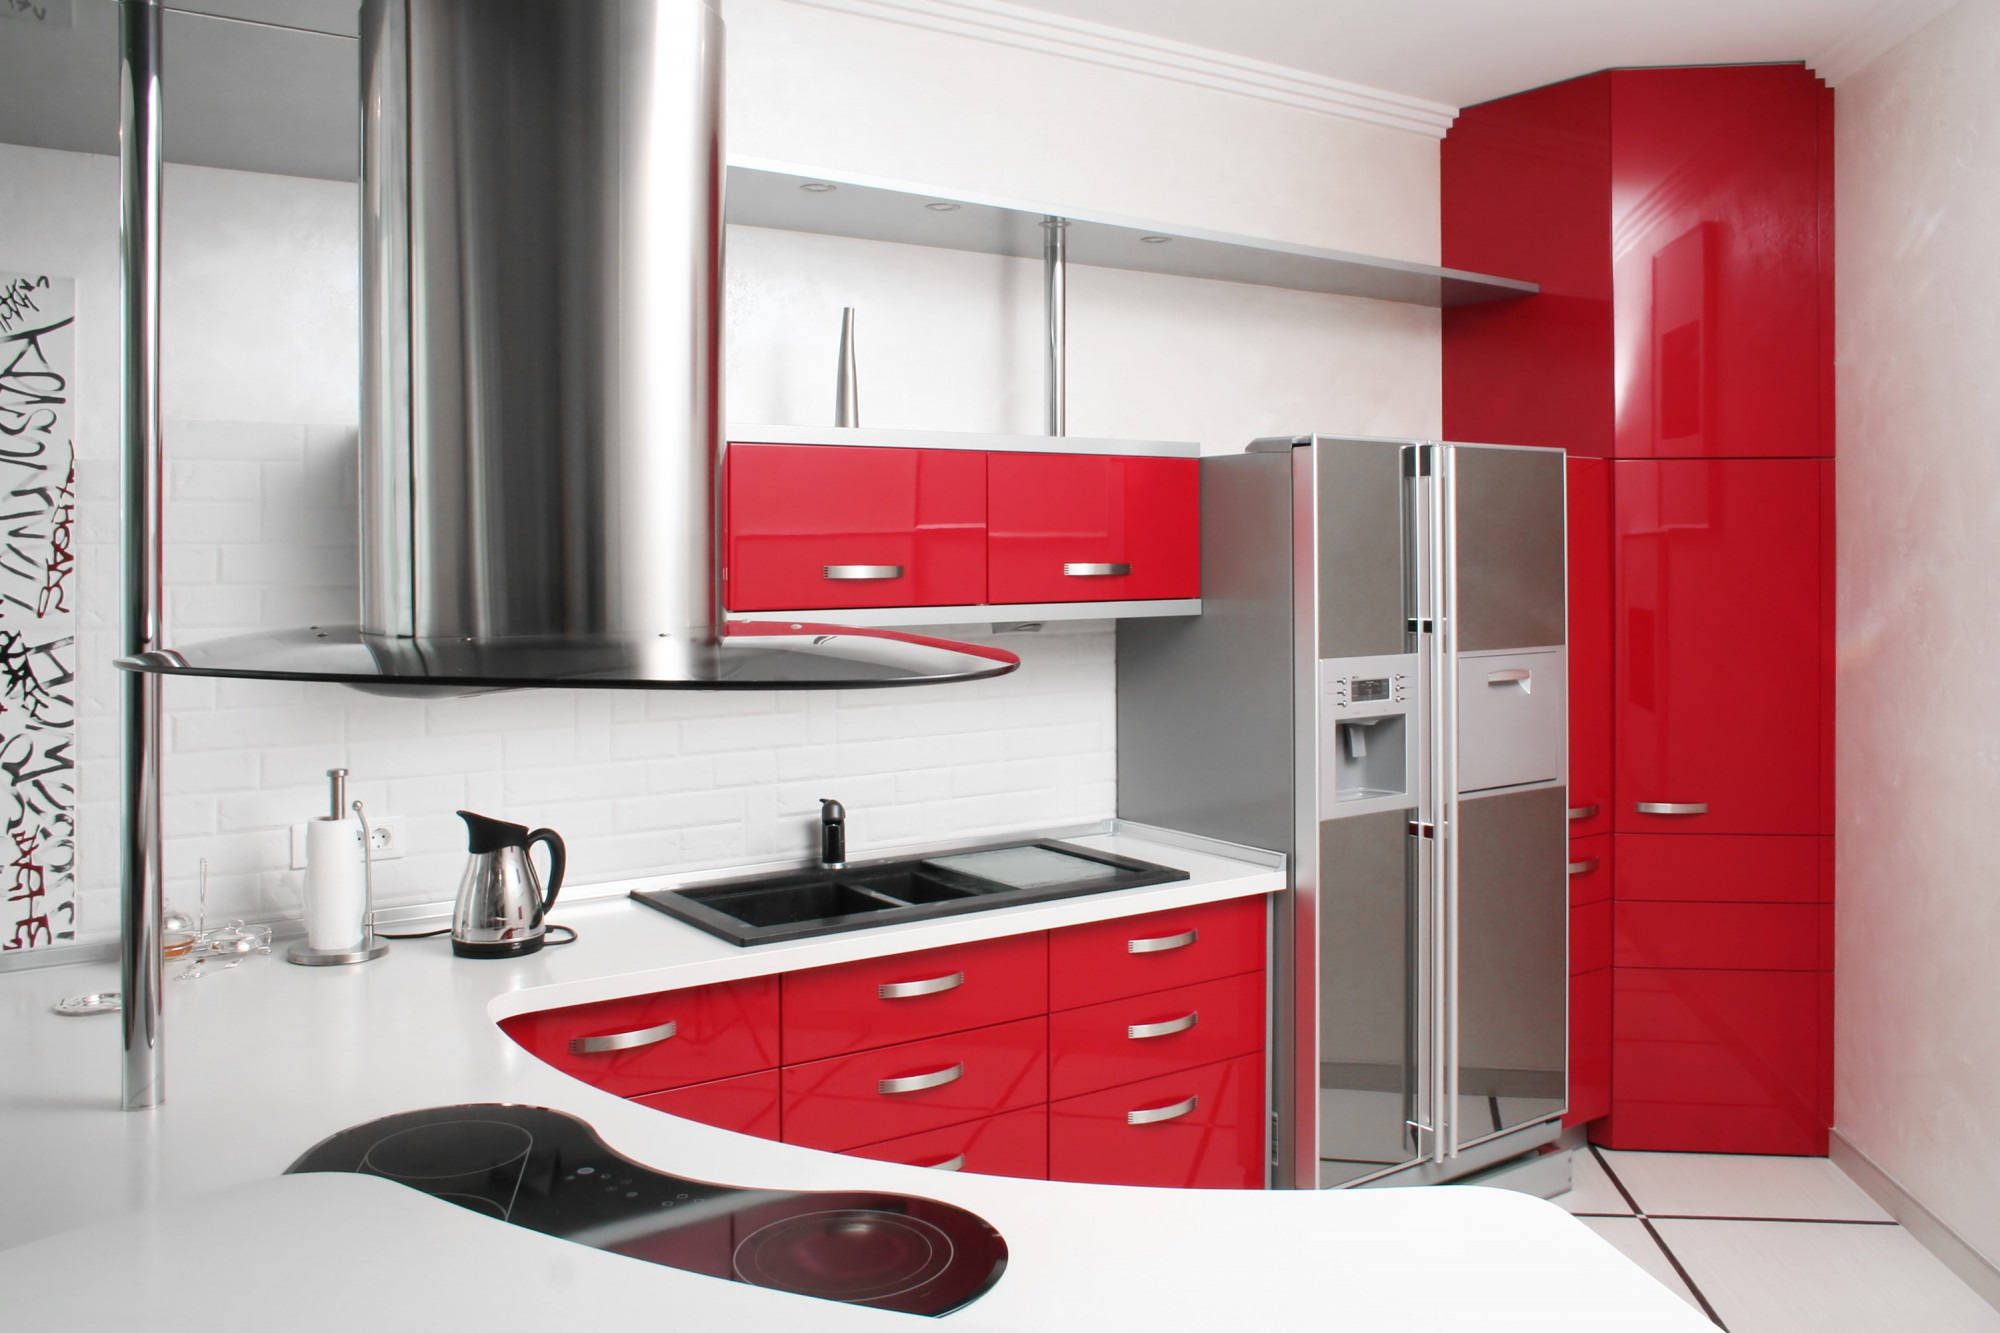 Červená kuchynská linka kombinovaná s bielou pracovnou doskou a zástenou